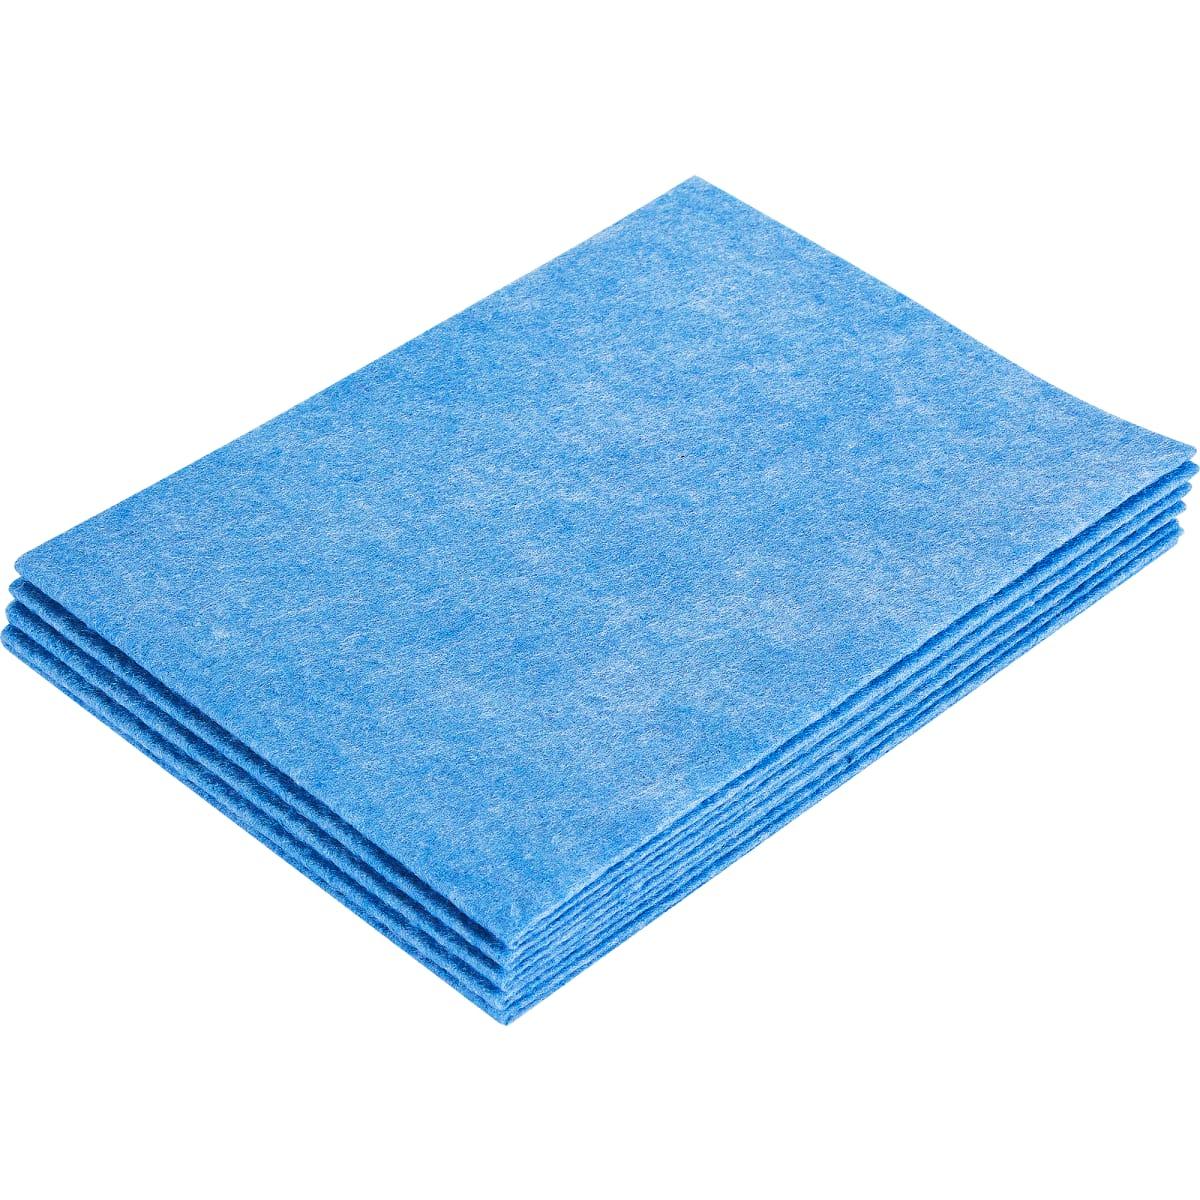 Nonwoven Multipurpose Viscose (10mx10pcs) blue